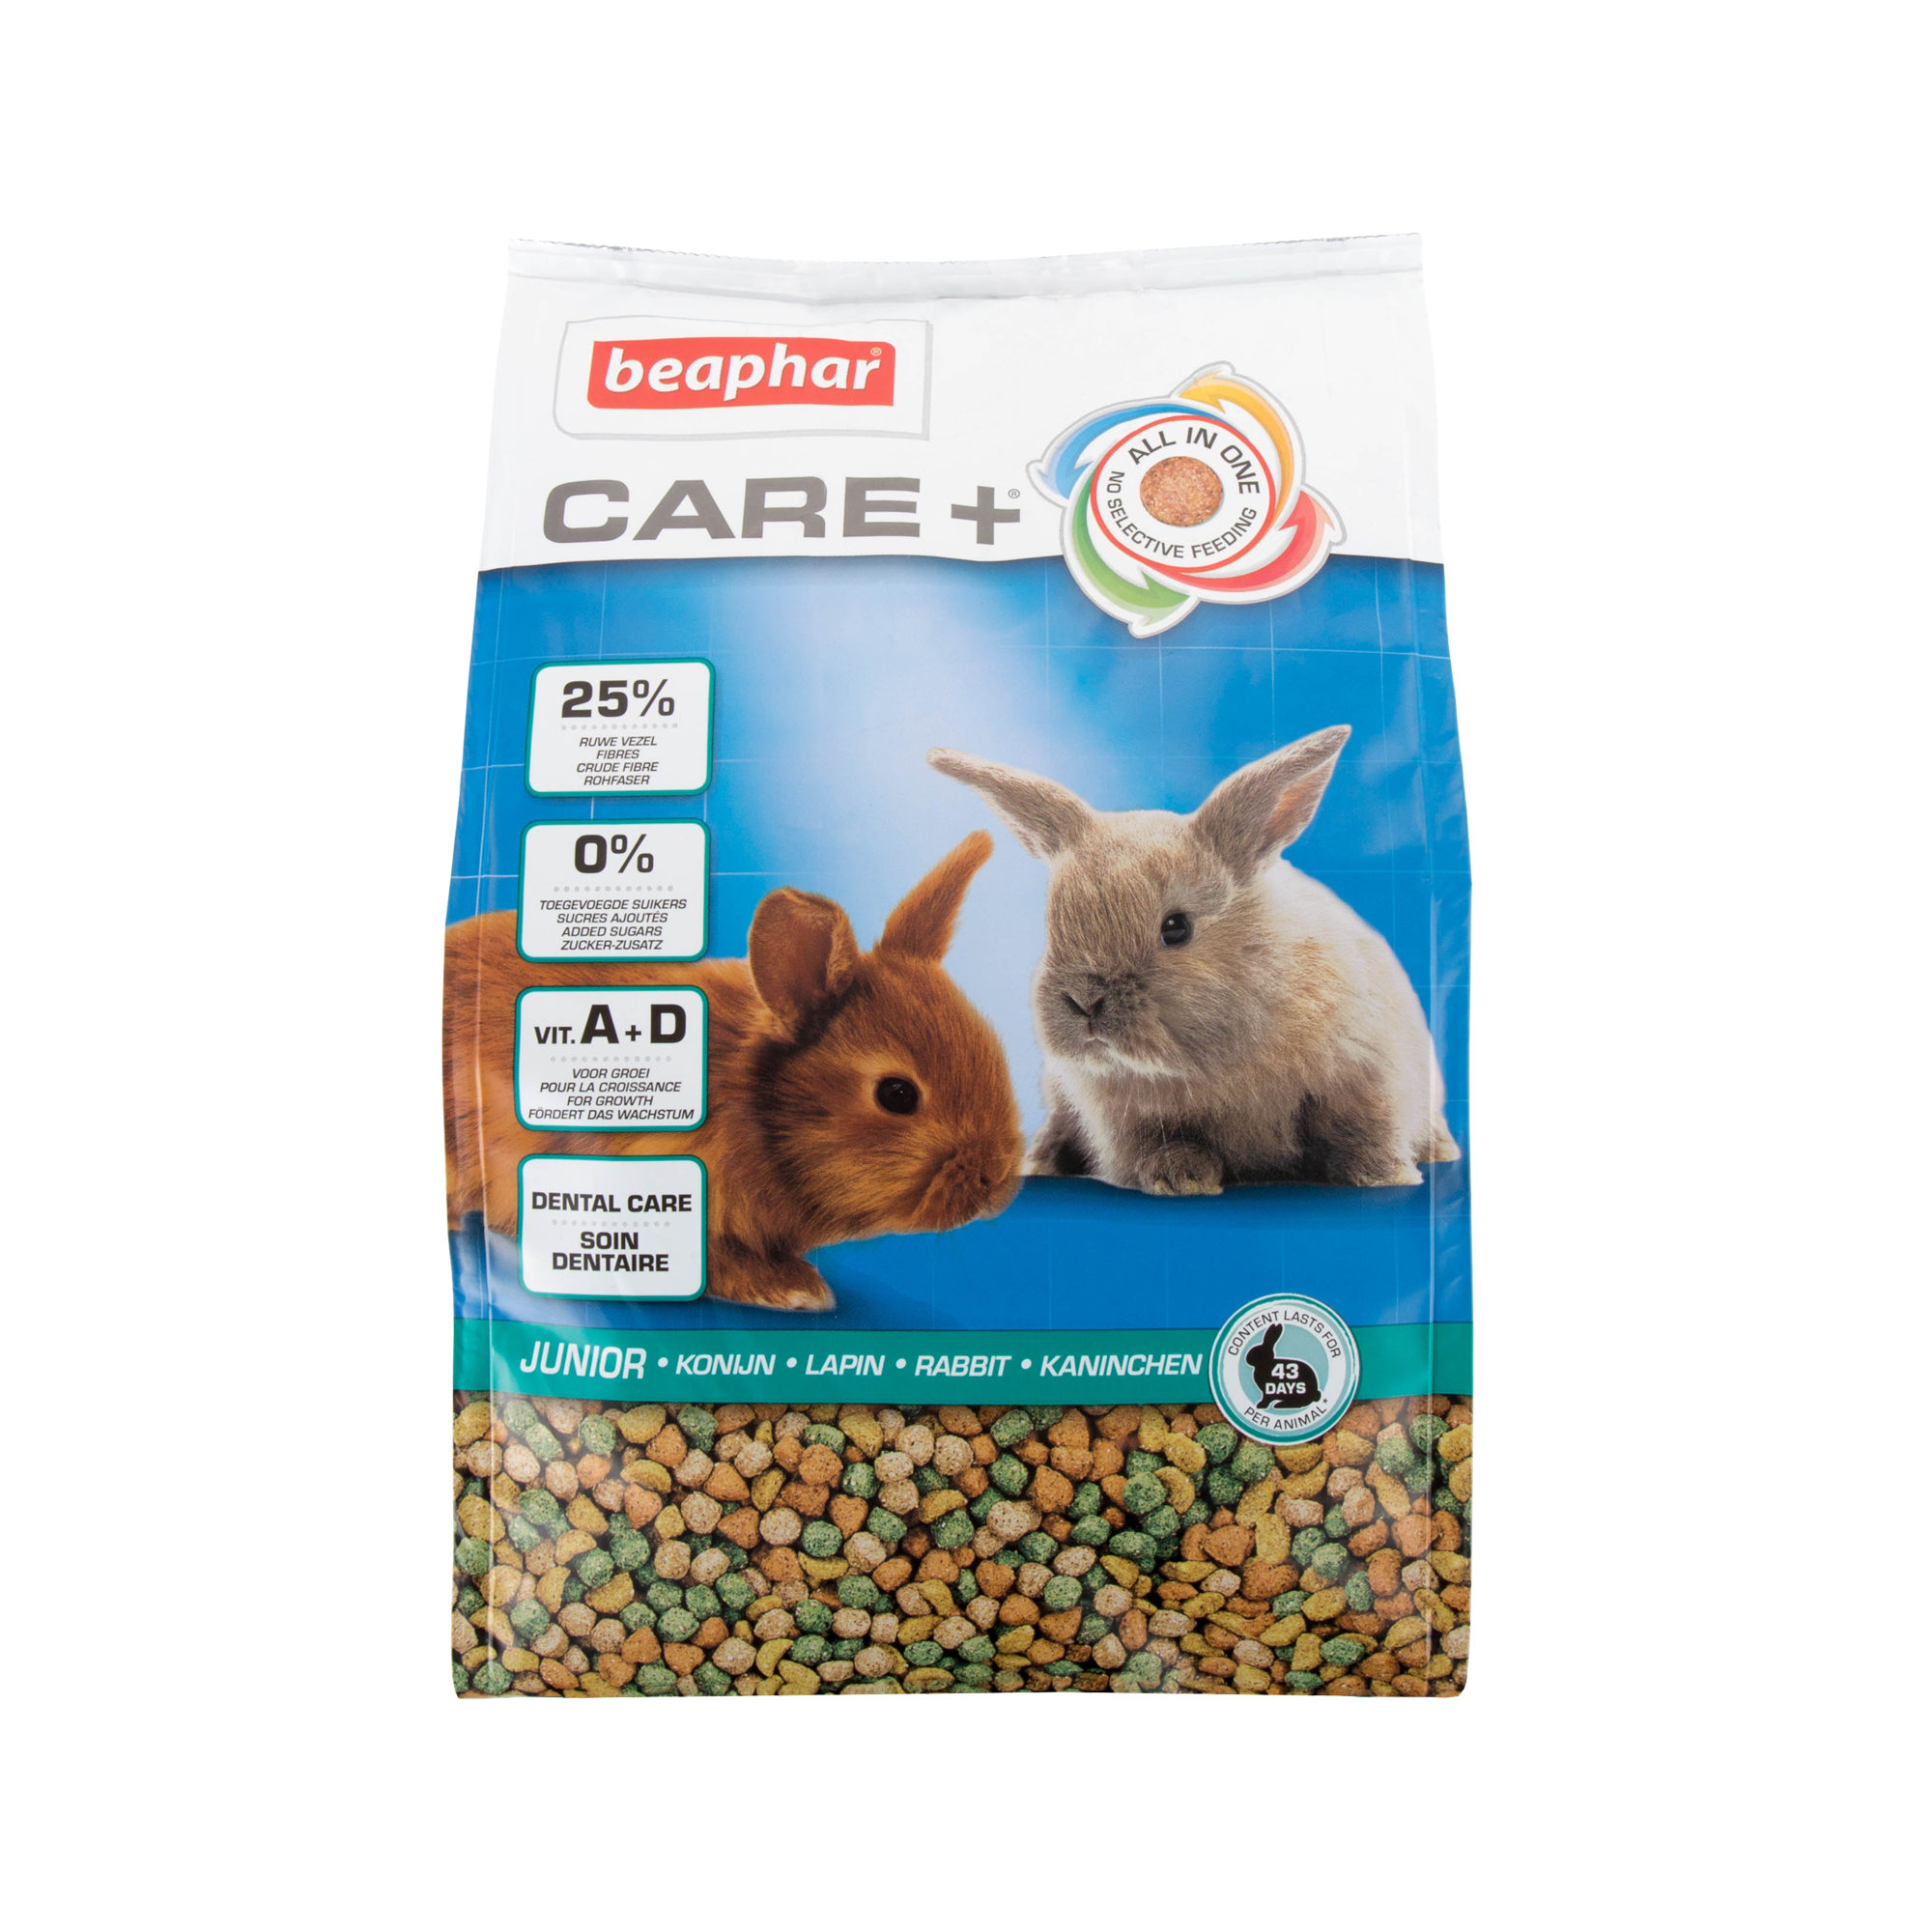 Beaphar Care+ - Lapin junior - 1,5 kg